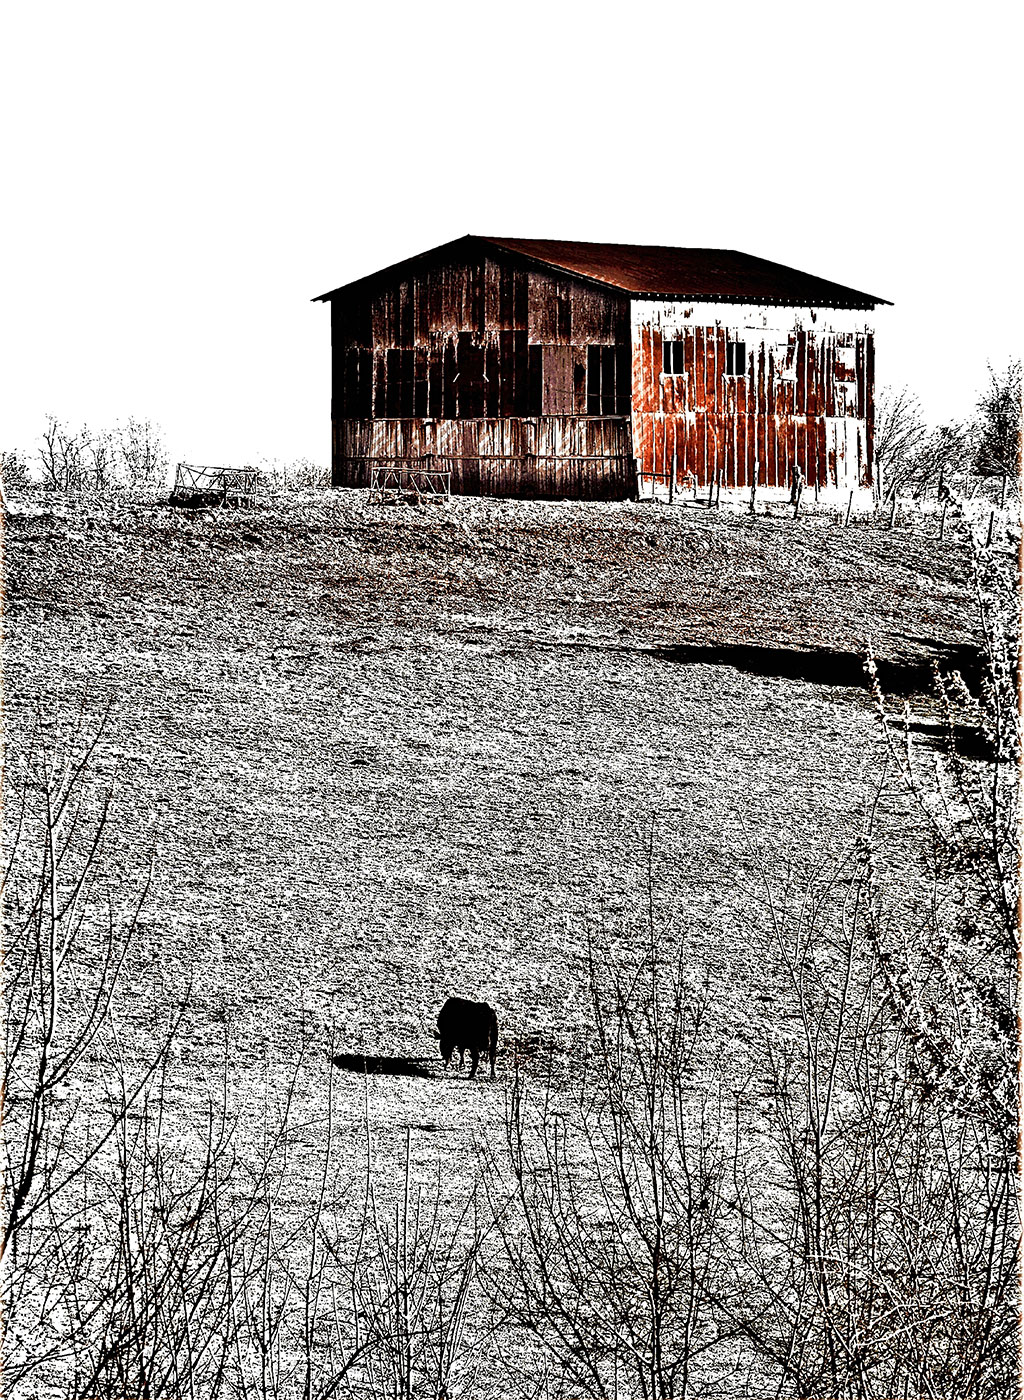 Sophisticated-Farmhouse-Artwork-The Sentry Backwater-Stills